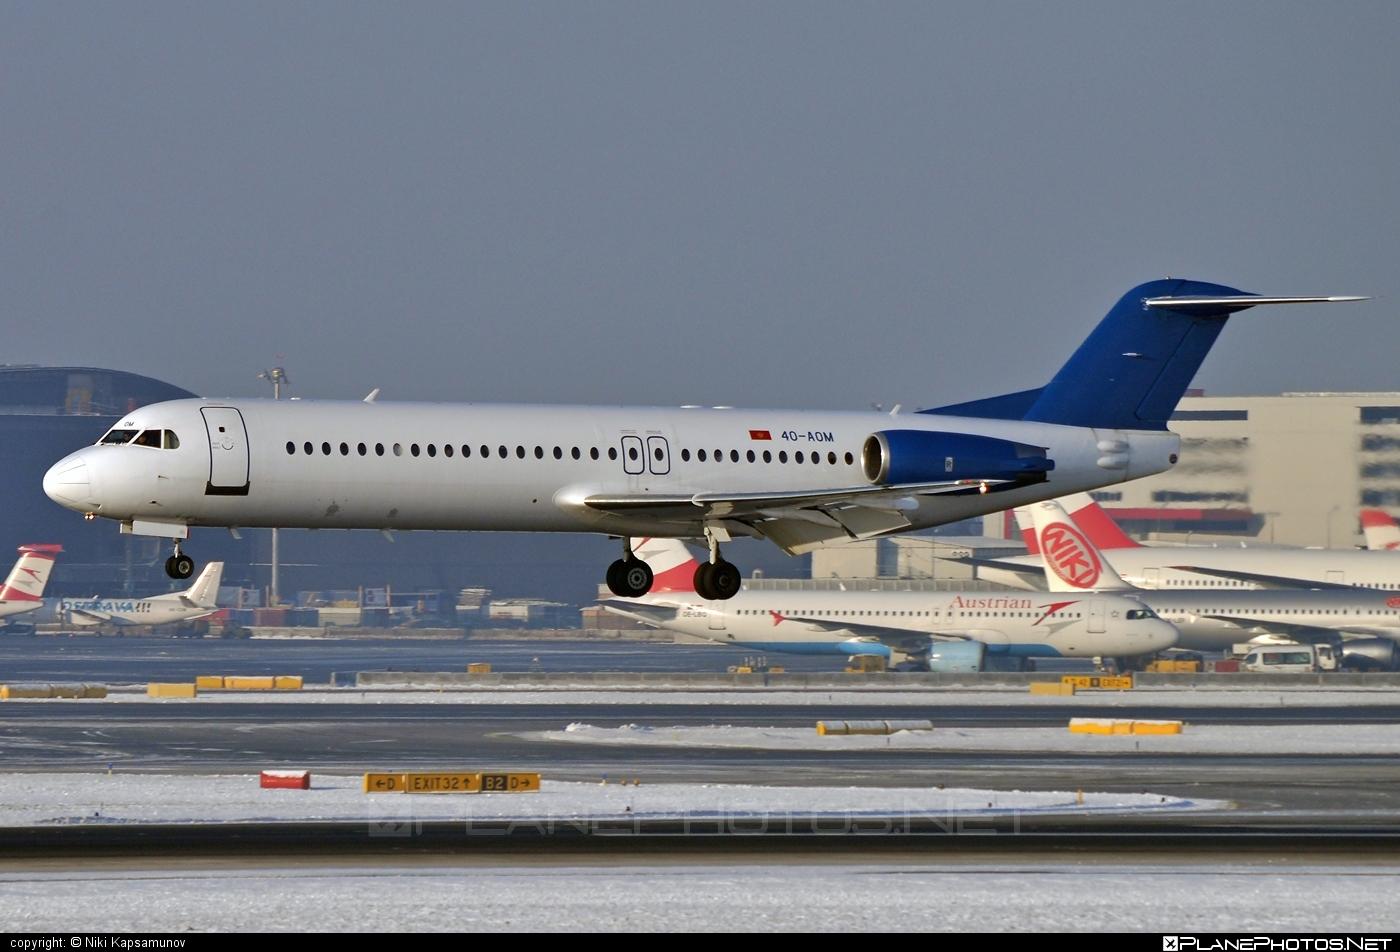 Fokker 100 - 4O-AOM operated by Montenegro Airlines #fokker #fokker100